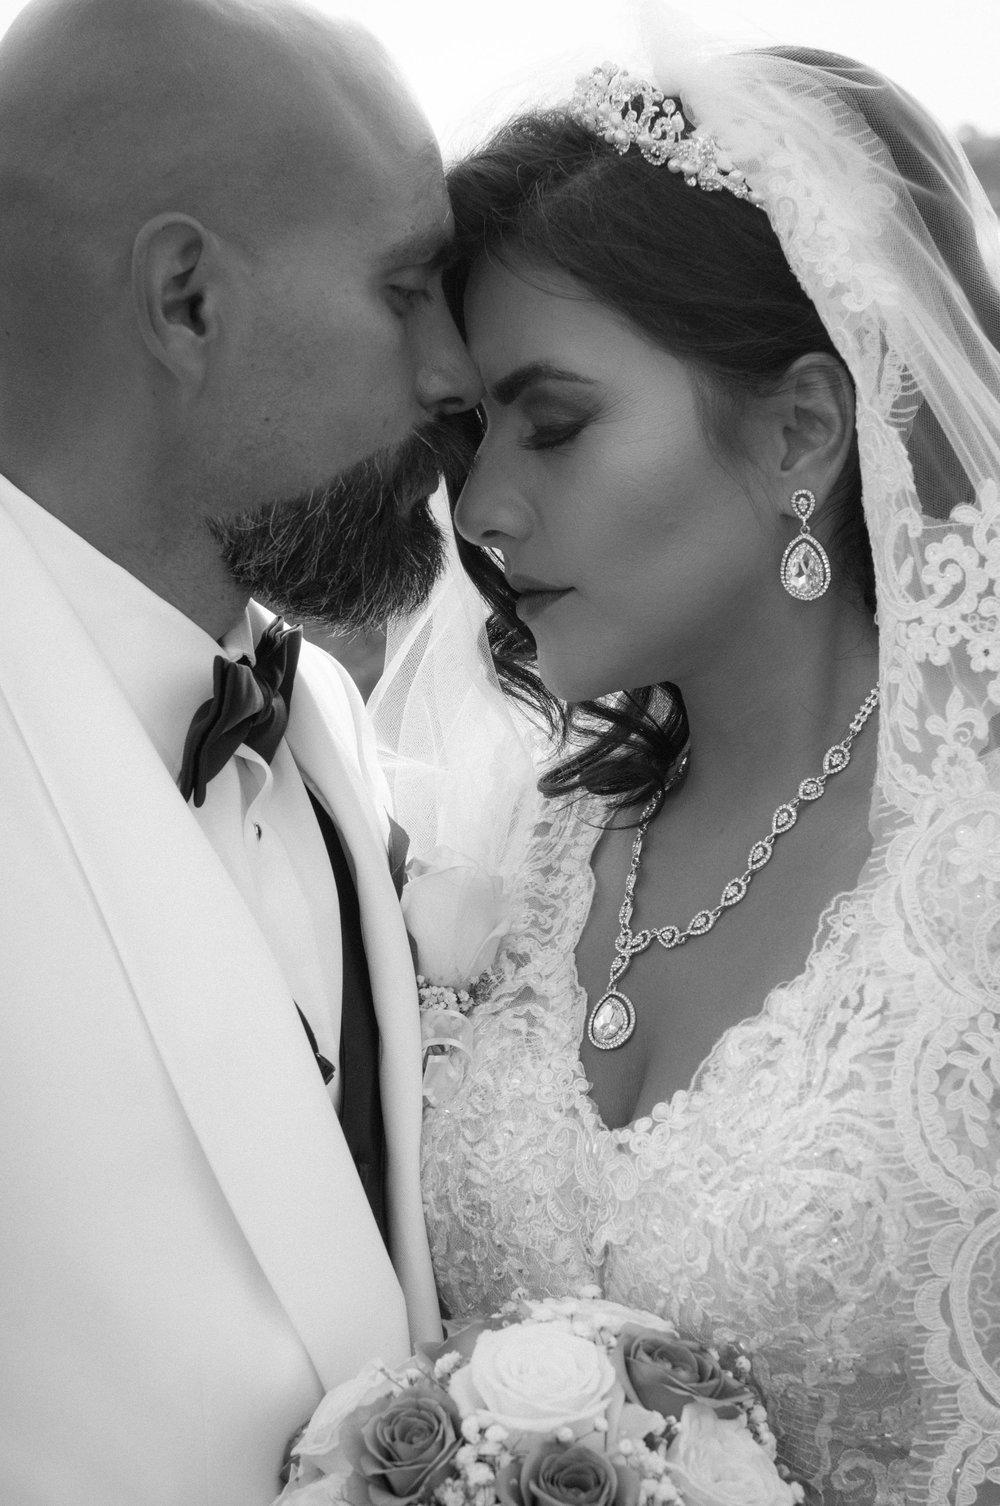 WEDDINGS - wedding and engagement images